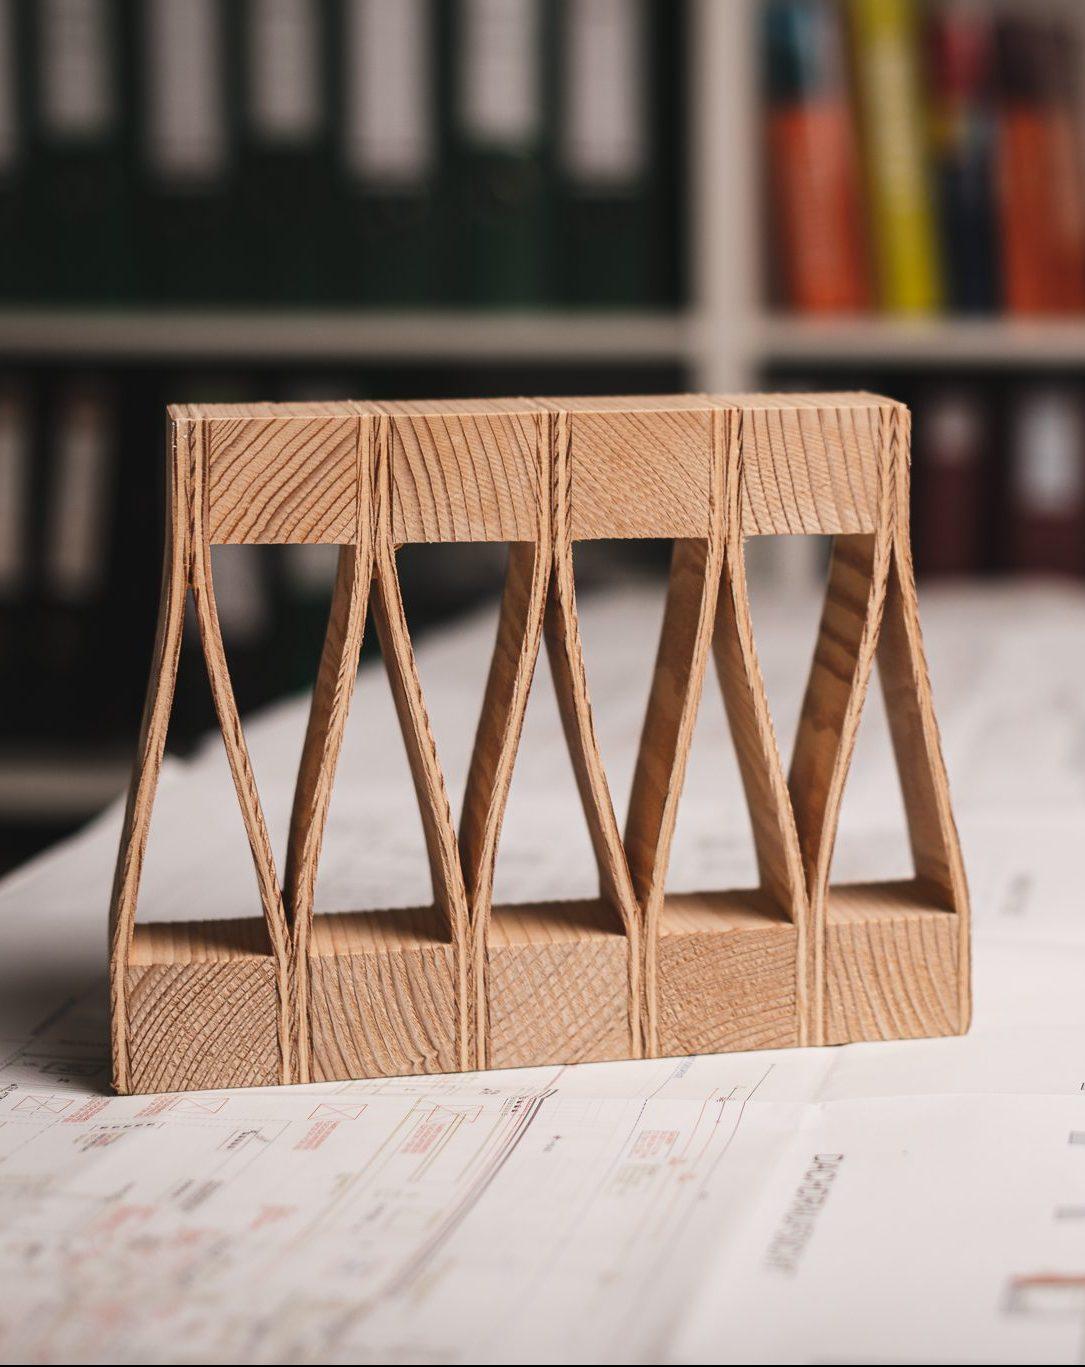 konstruktiver Holzbau